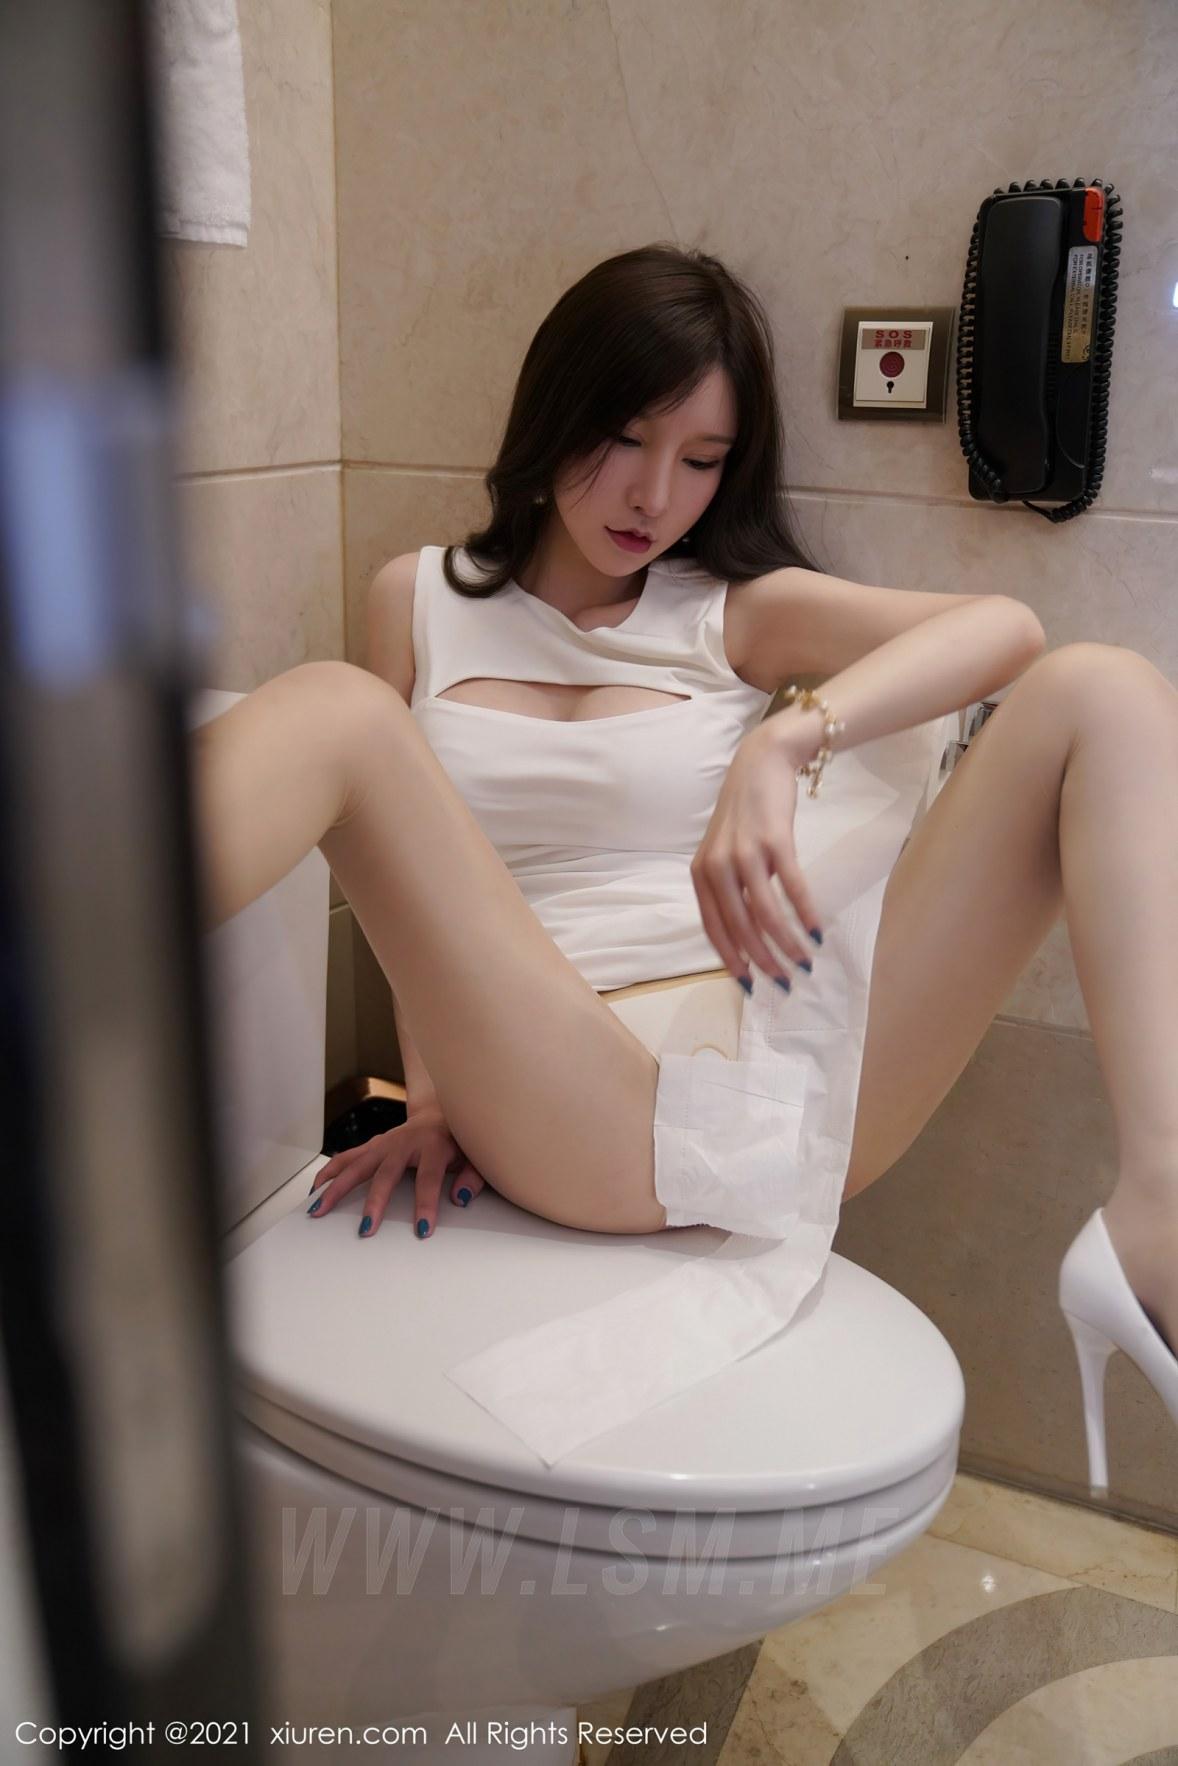 3576 064 j8b 3603 5400 - XiuRen 秀人 No.3576 周于希sandy 浴室诱惑 - 秀人网 -【免费在线写真】【丽人丝语】